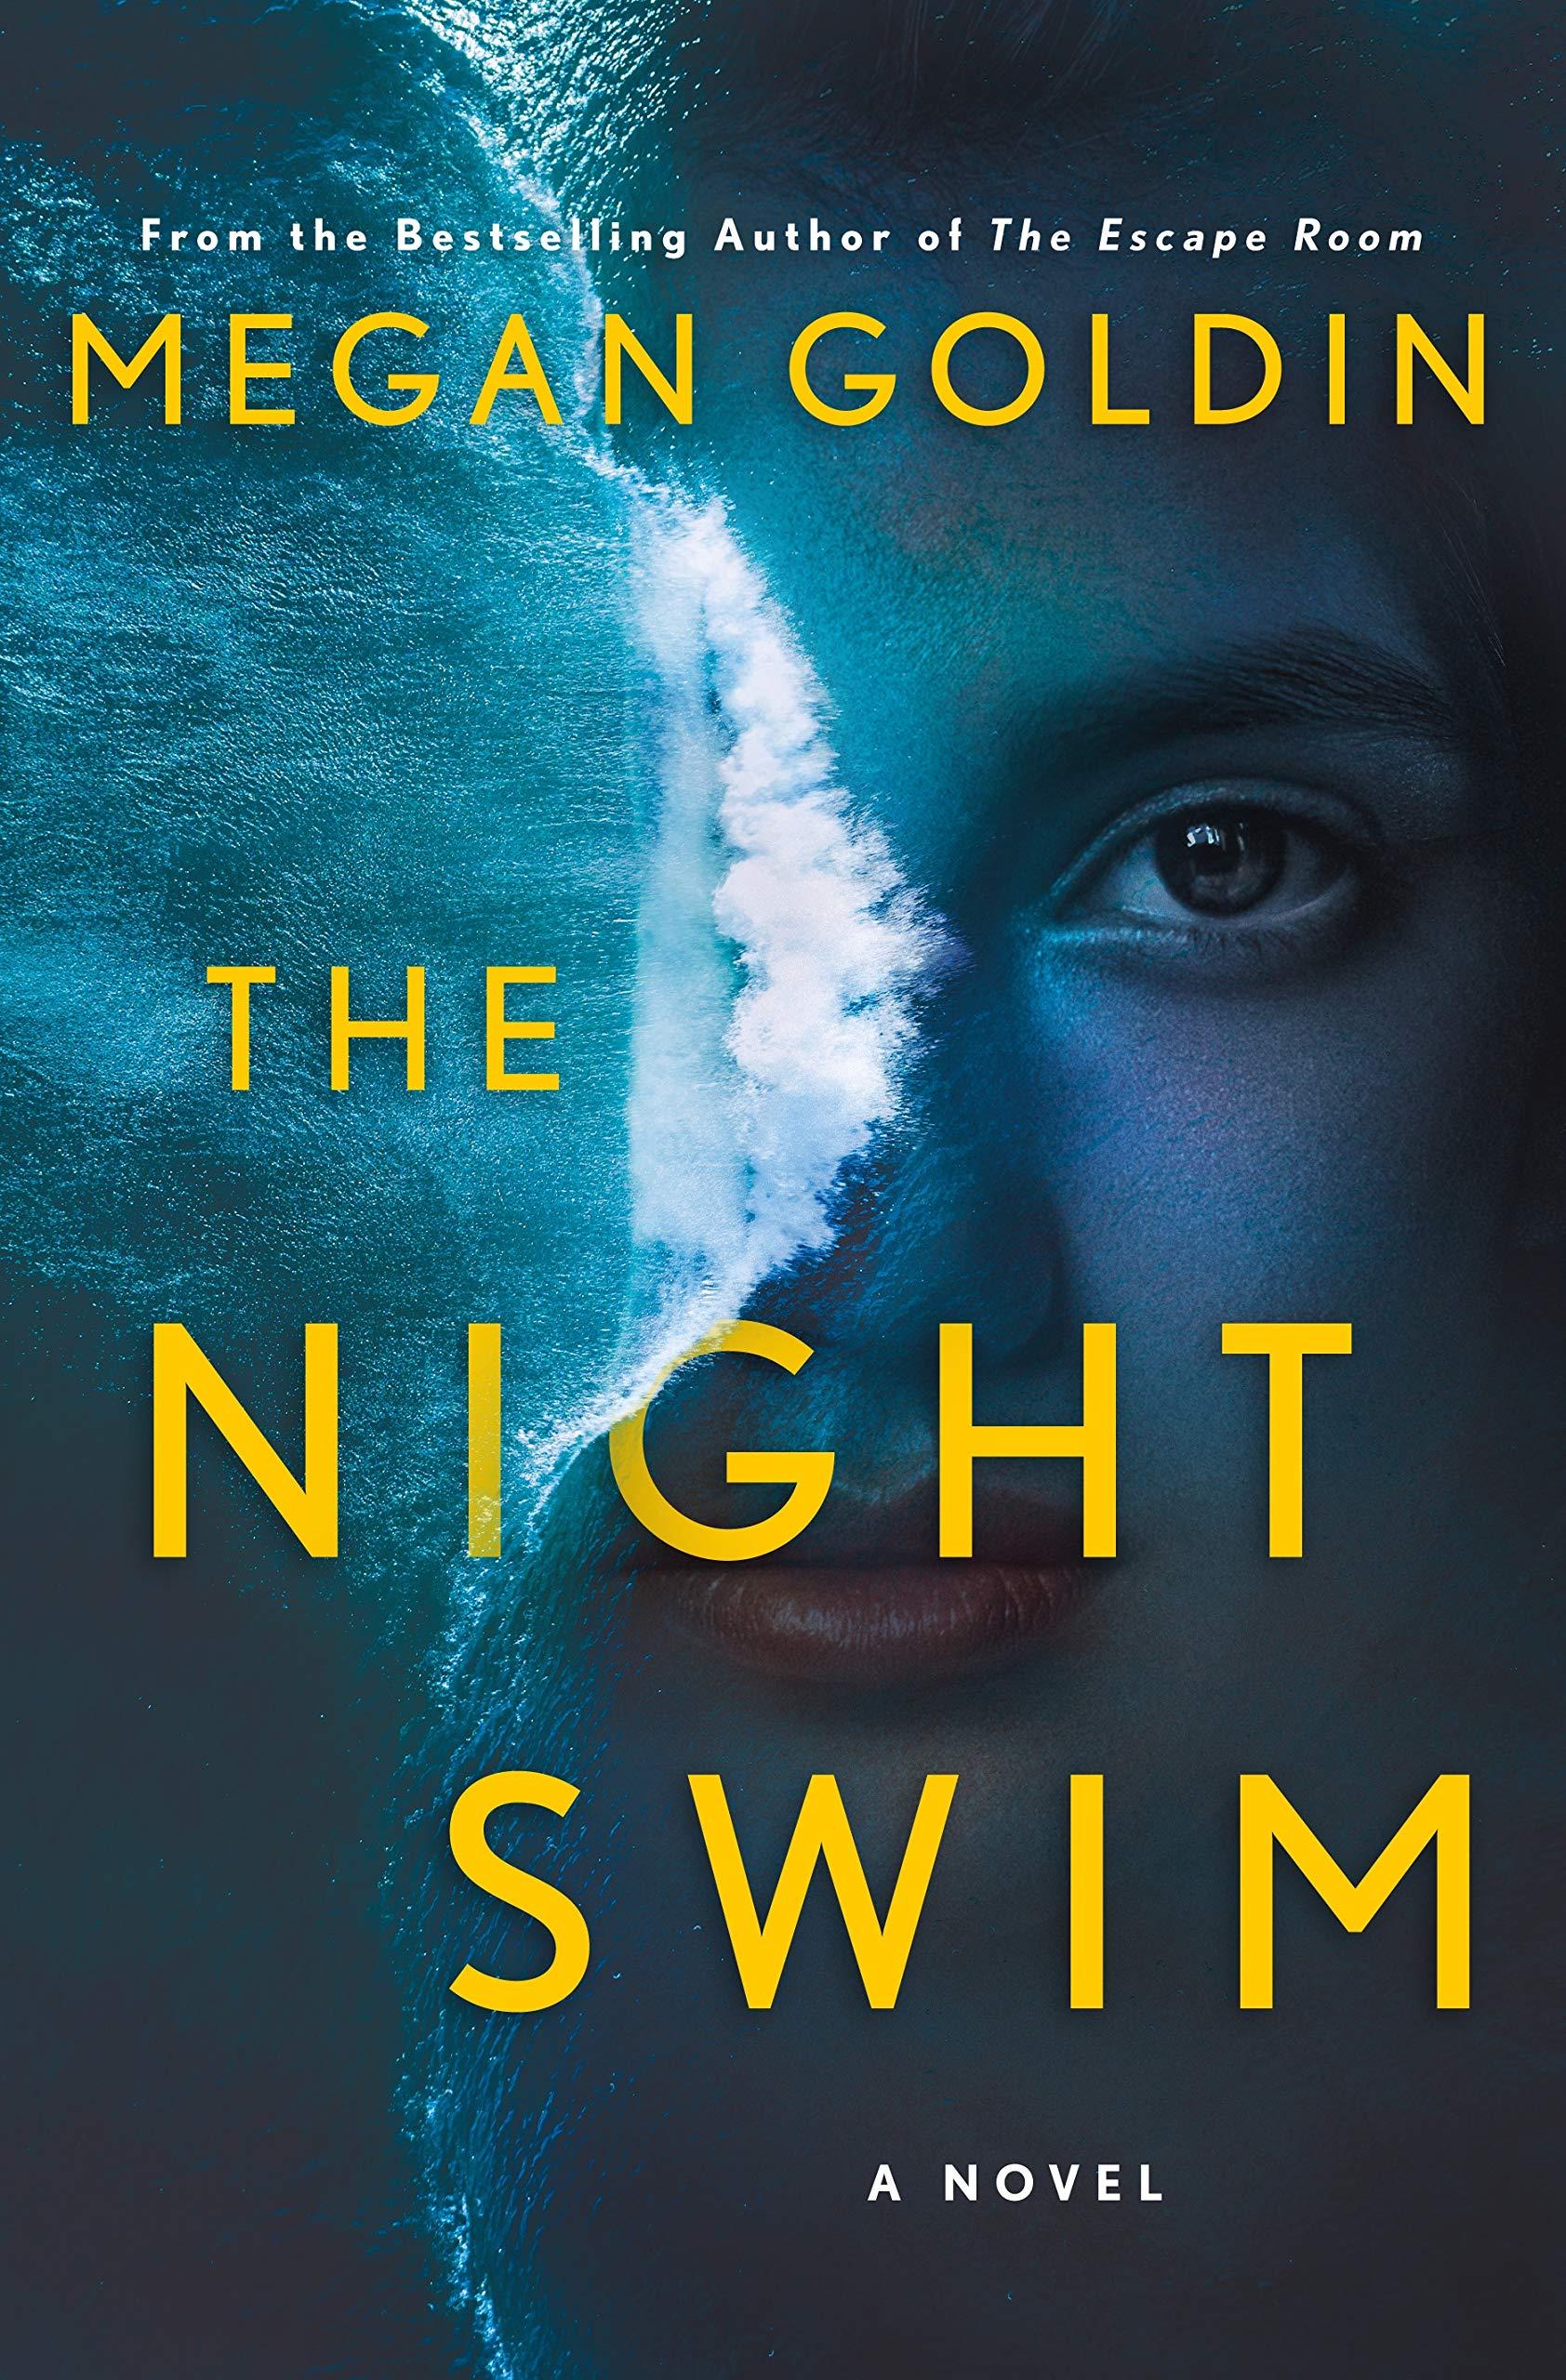 Amazon.com: The Night Swim: A Novel (9781250219688): Goldin, Megan ...